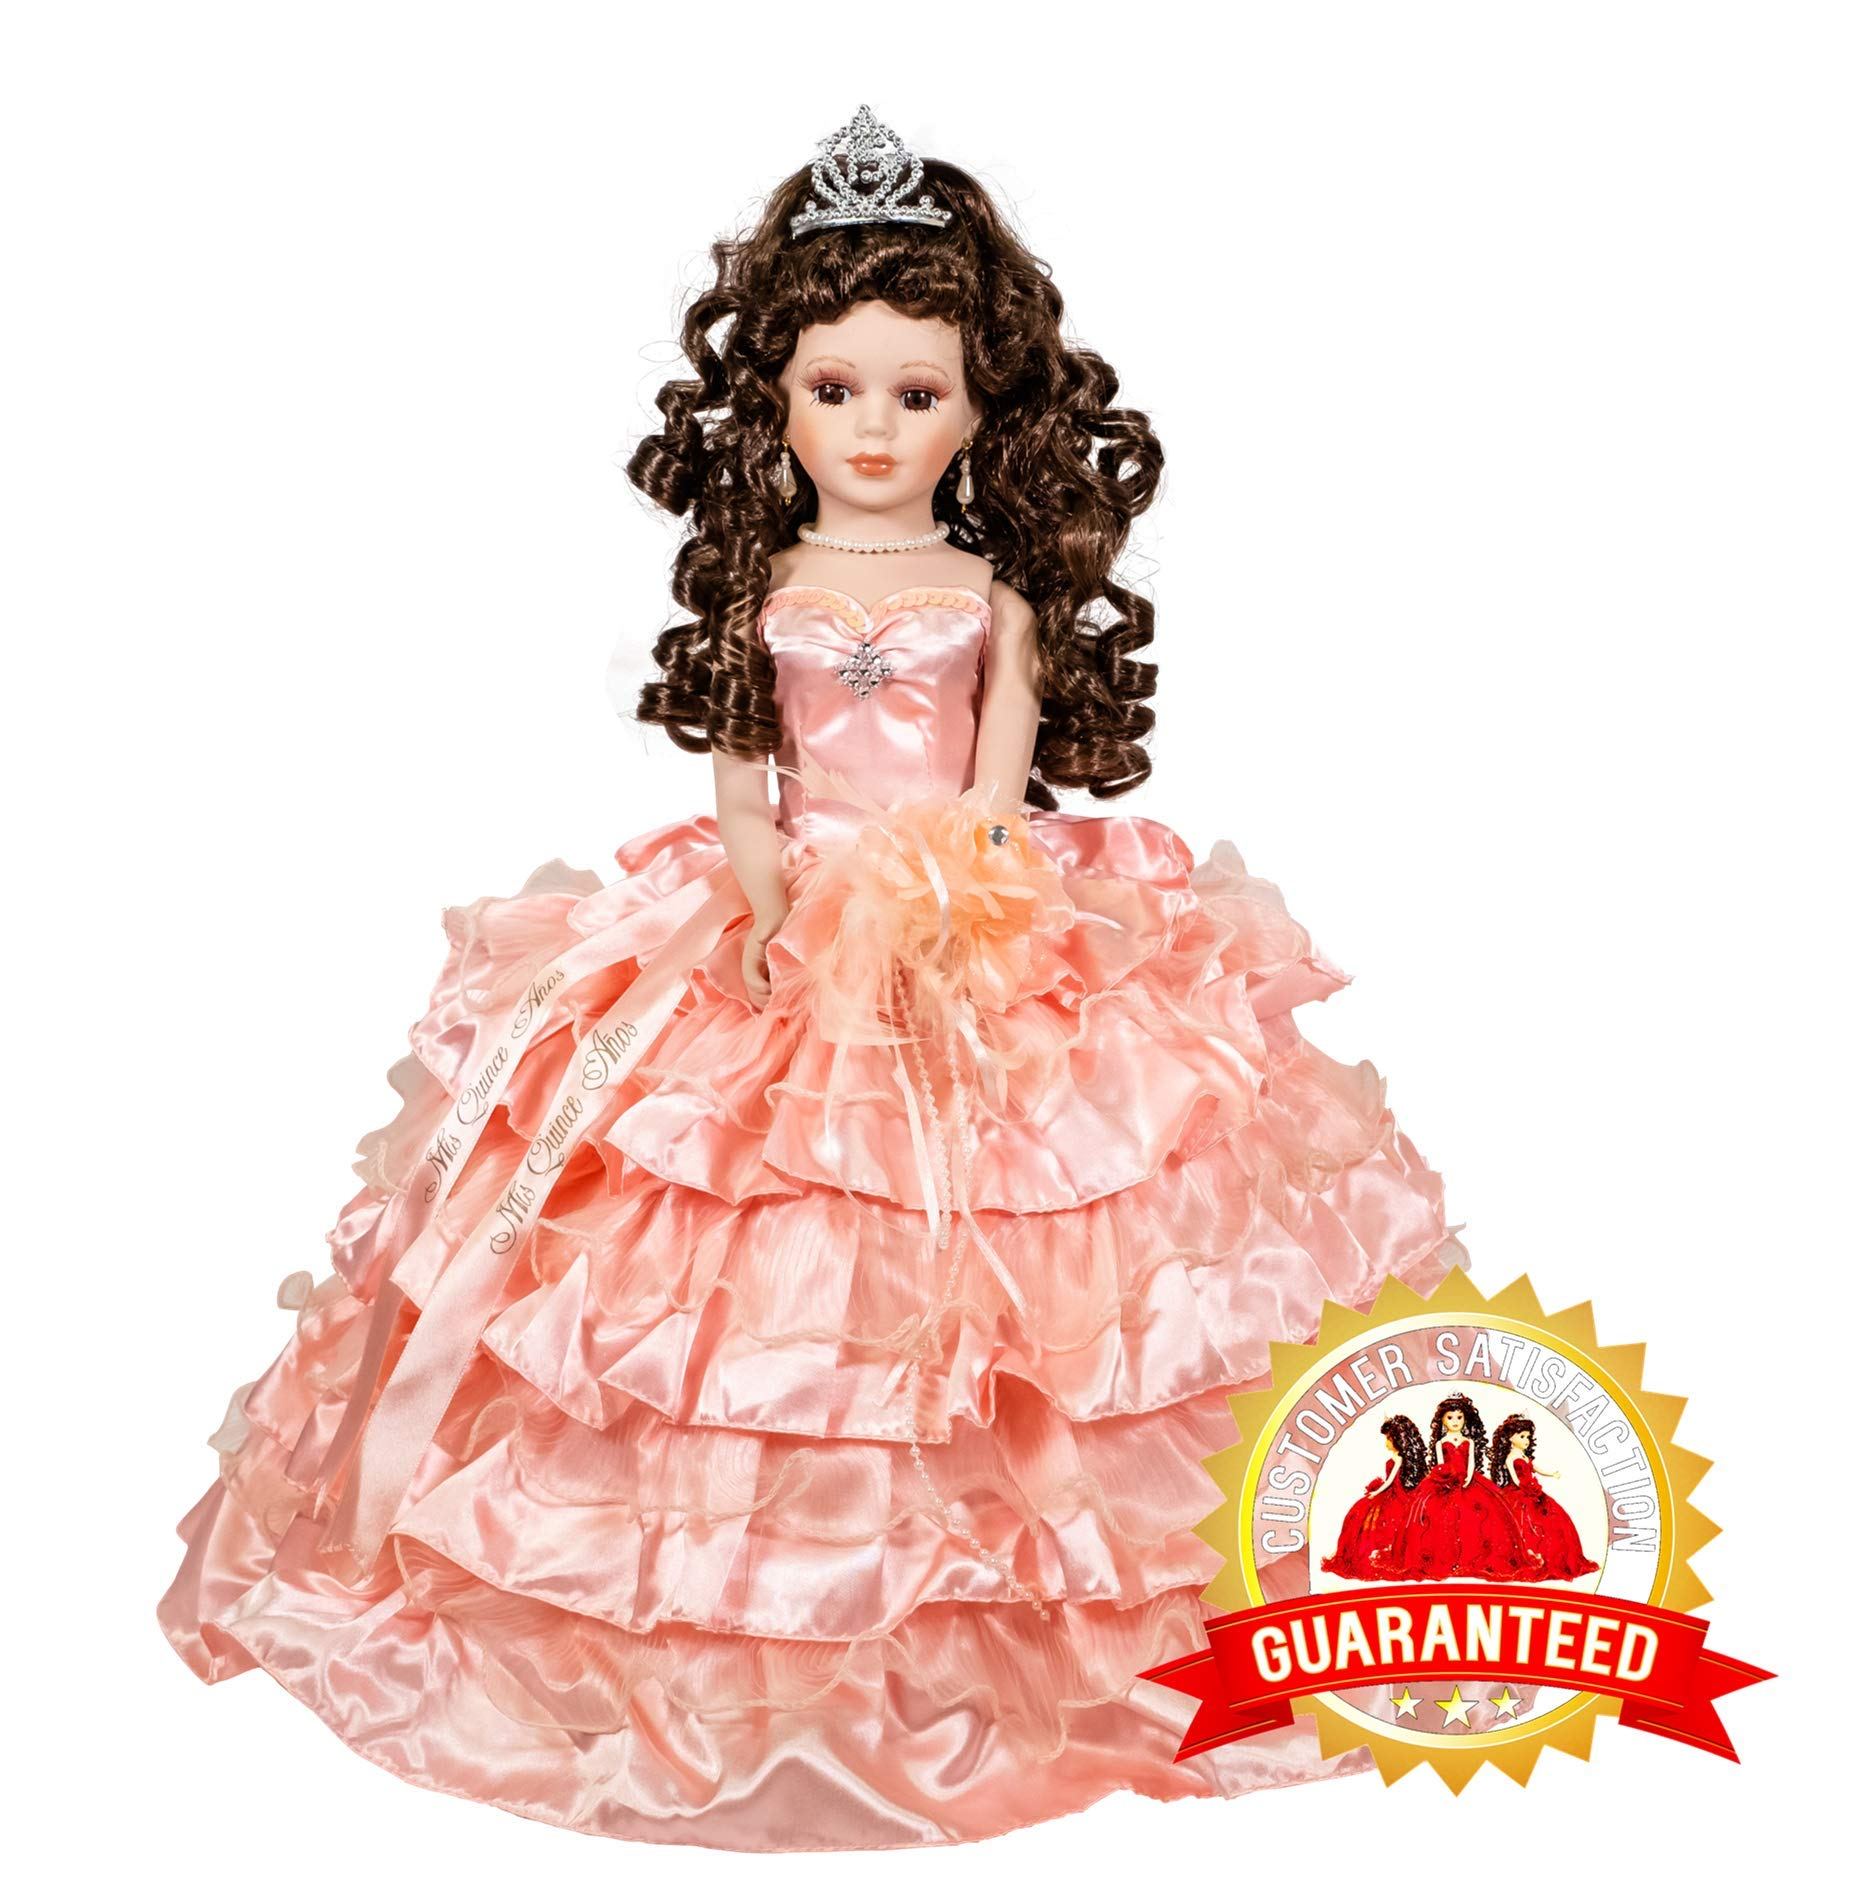 Kinnex Collections by Amanda 18'' Porcelain Quinceanera Umbrella Doll (Table Centerpiece) ~ Blush~ KK18729-29